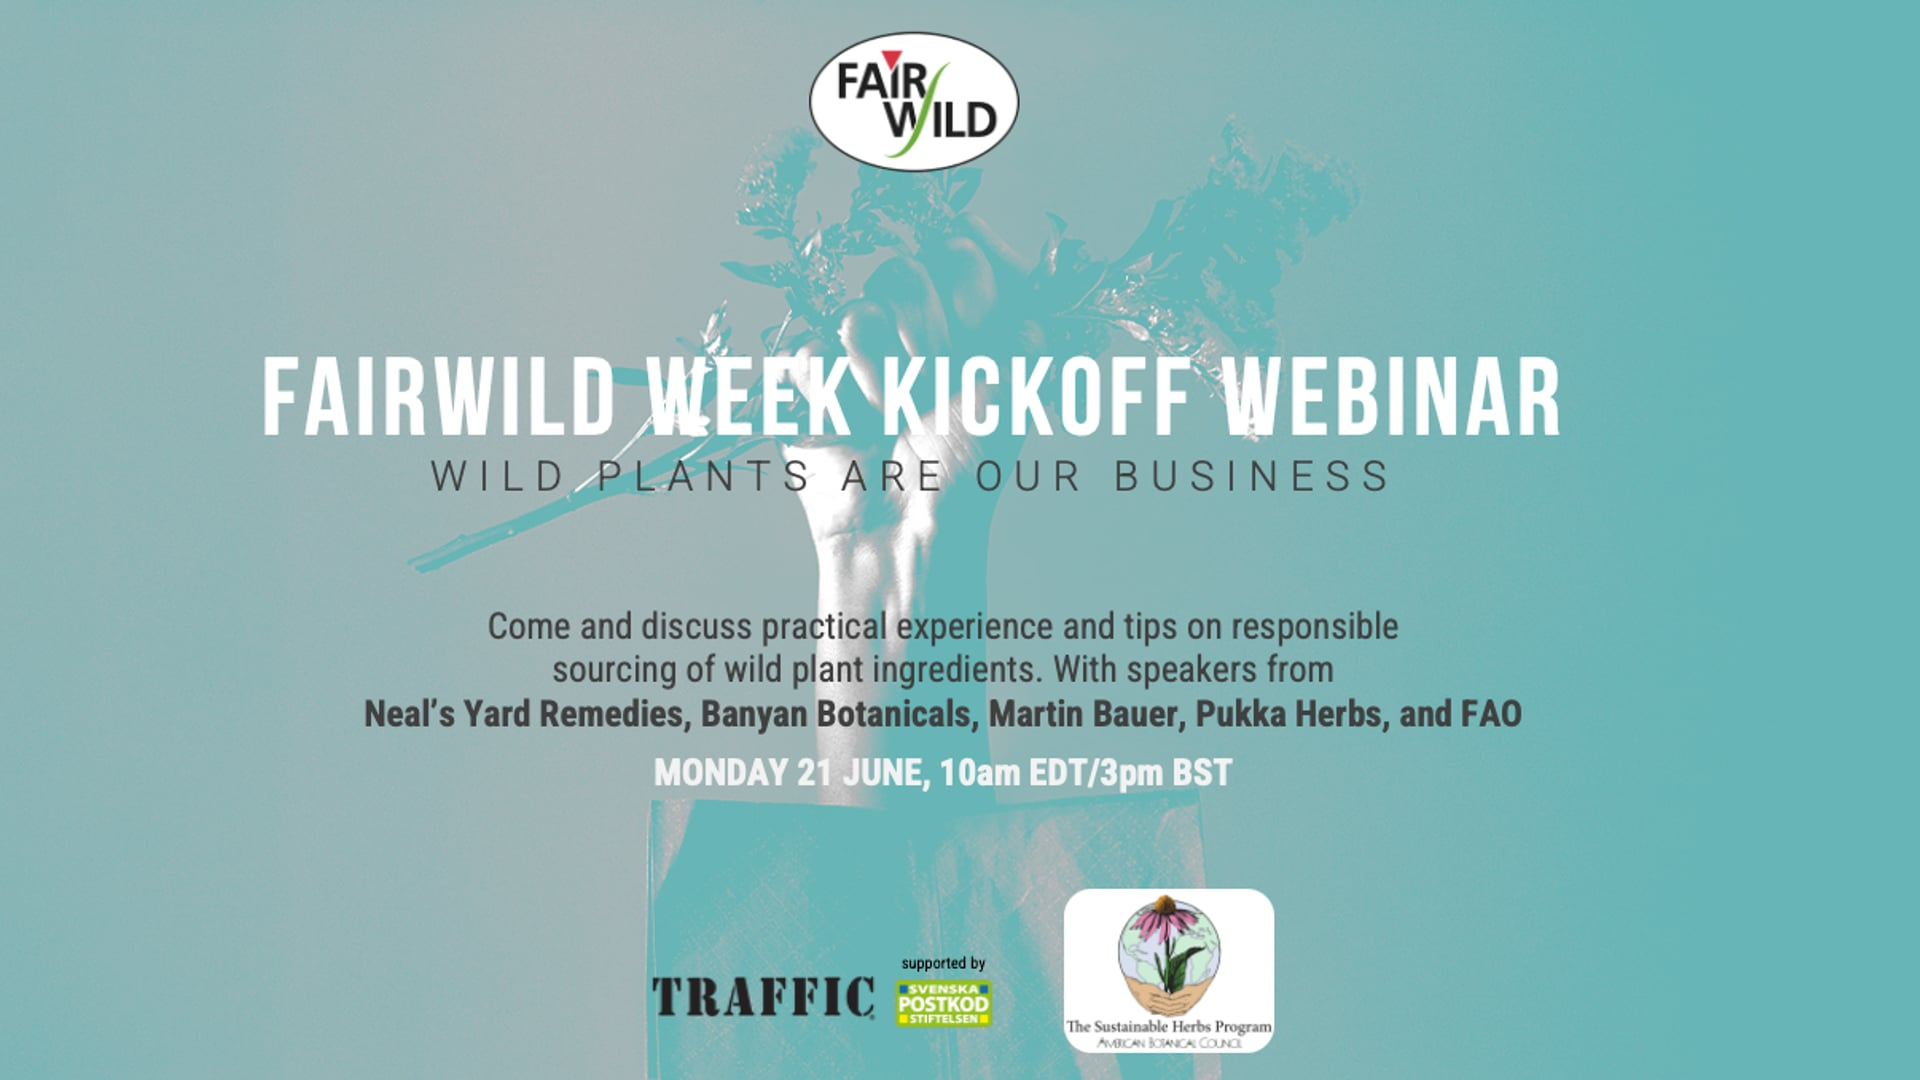 FairWild Week